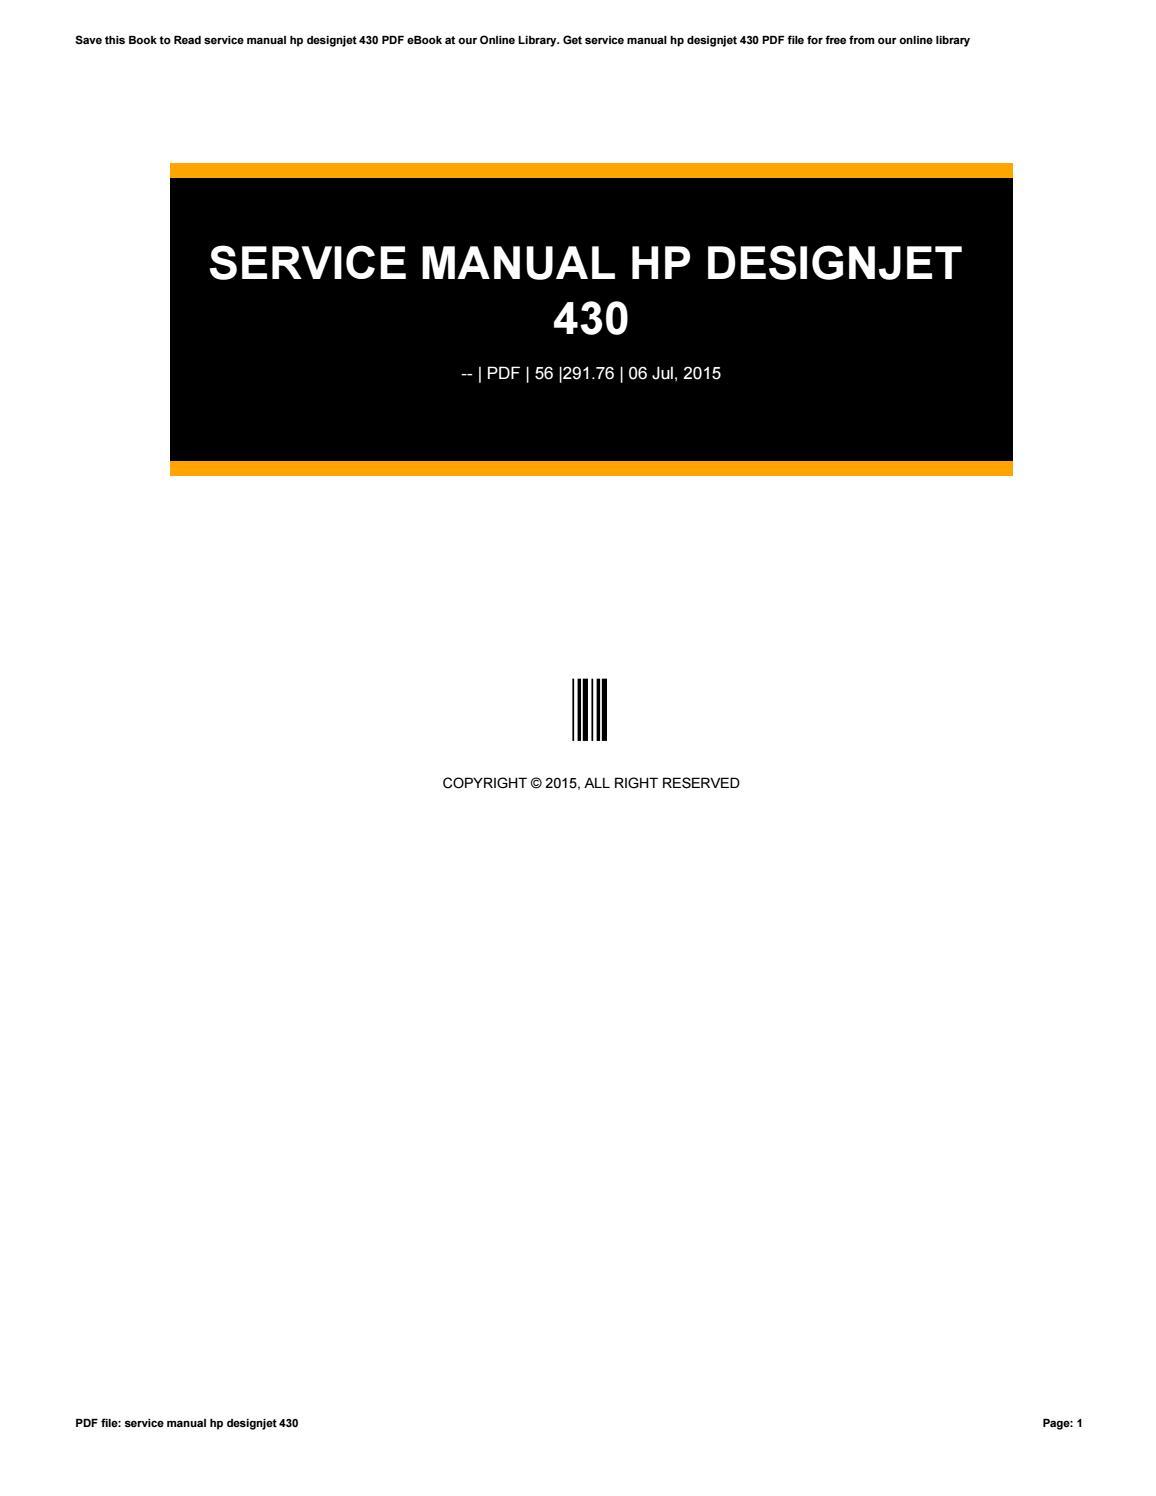 hp designjet printer manual ebook